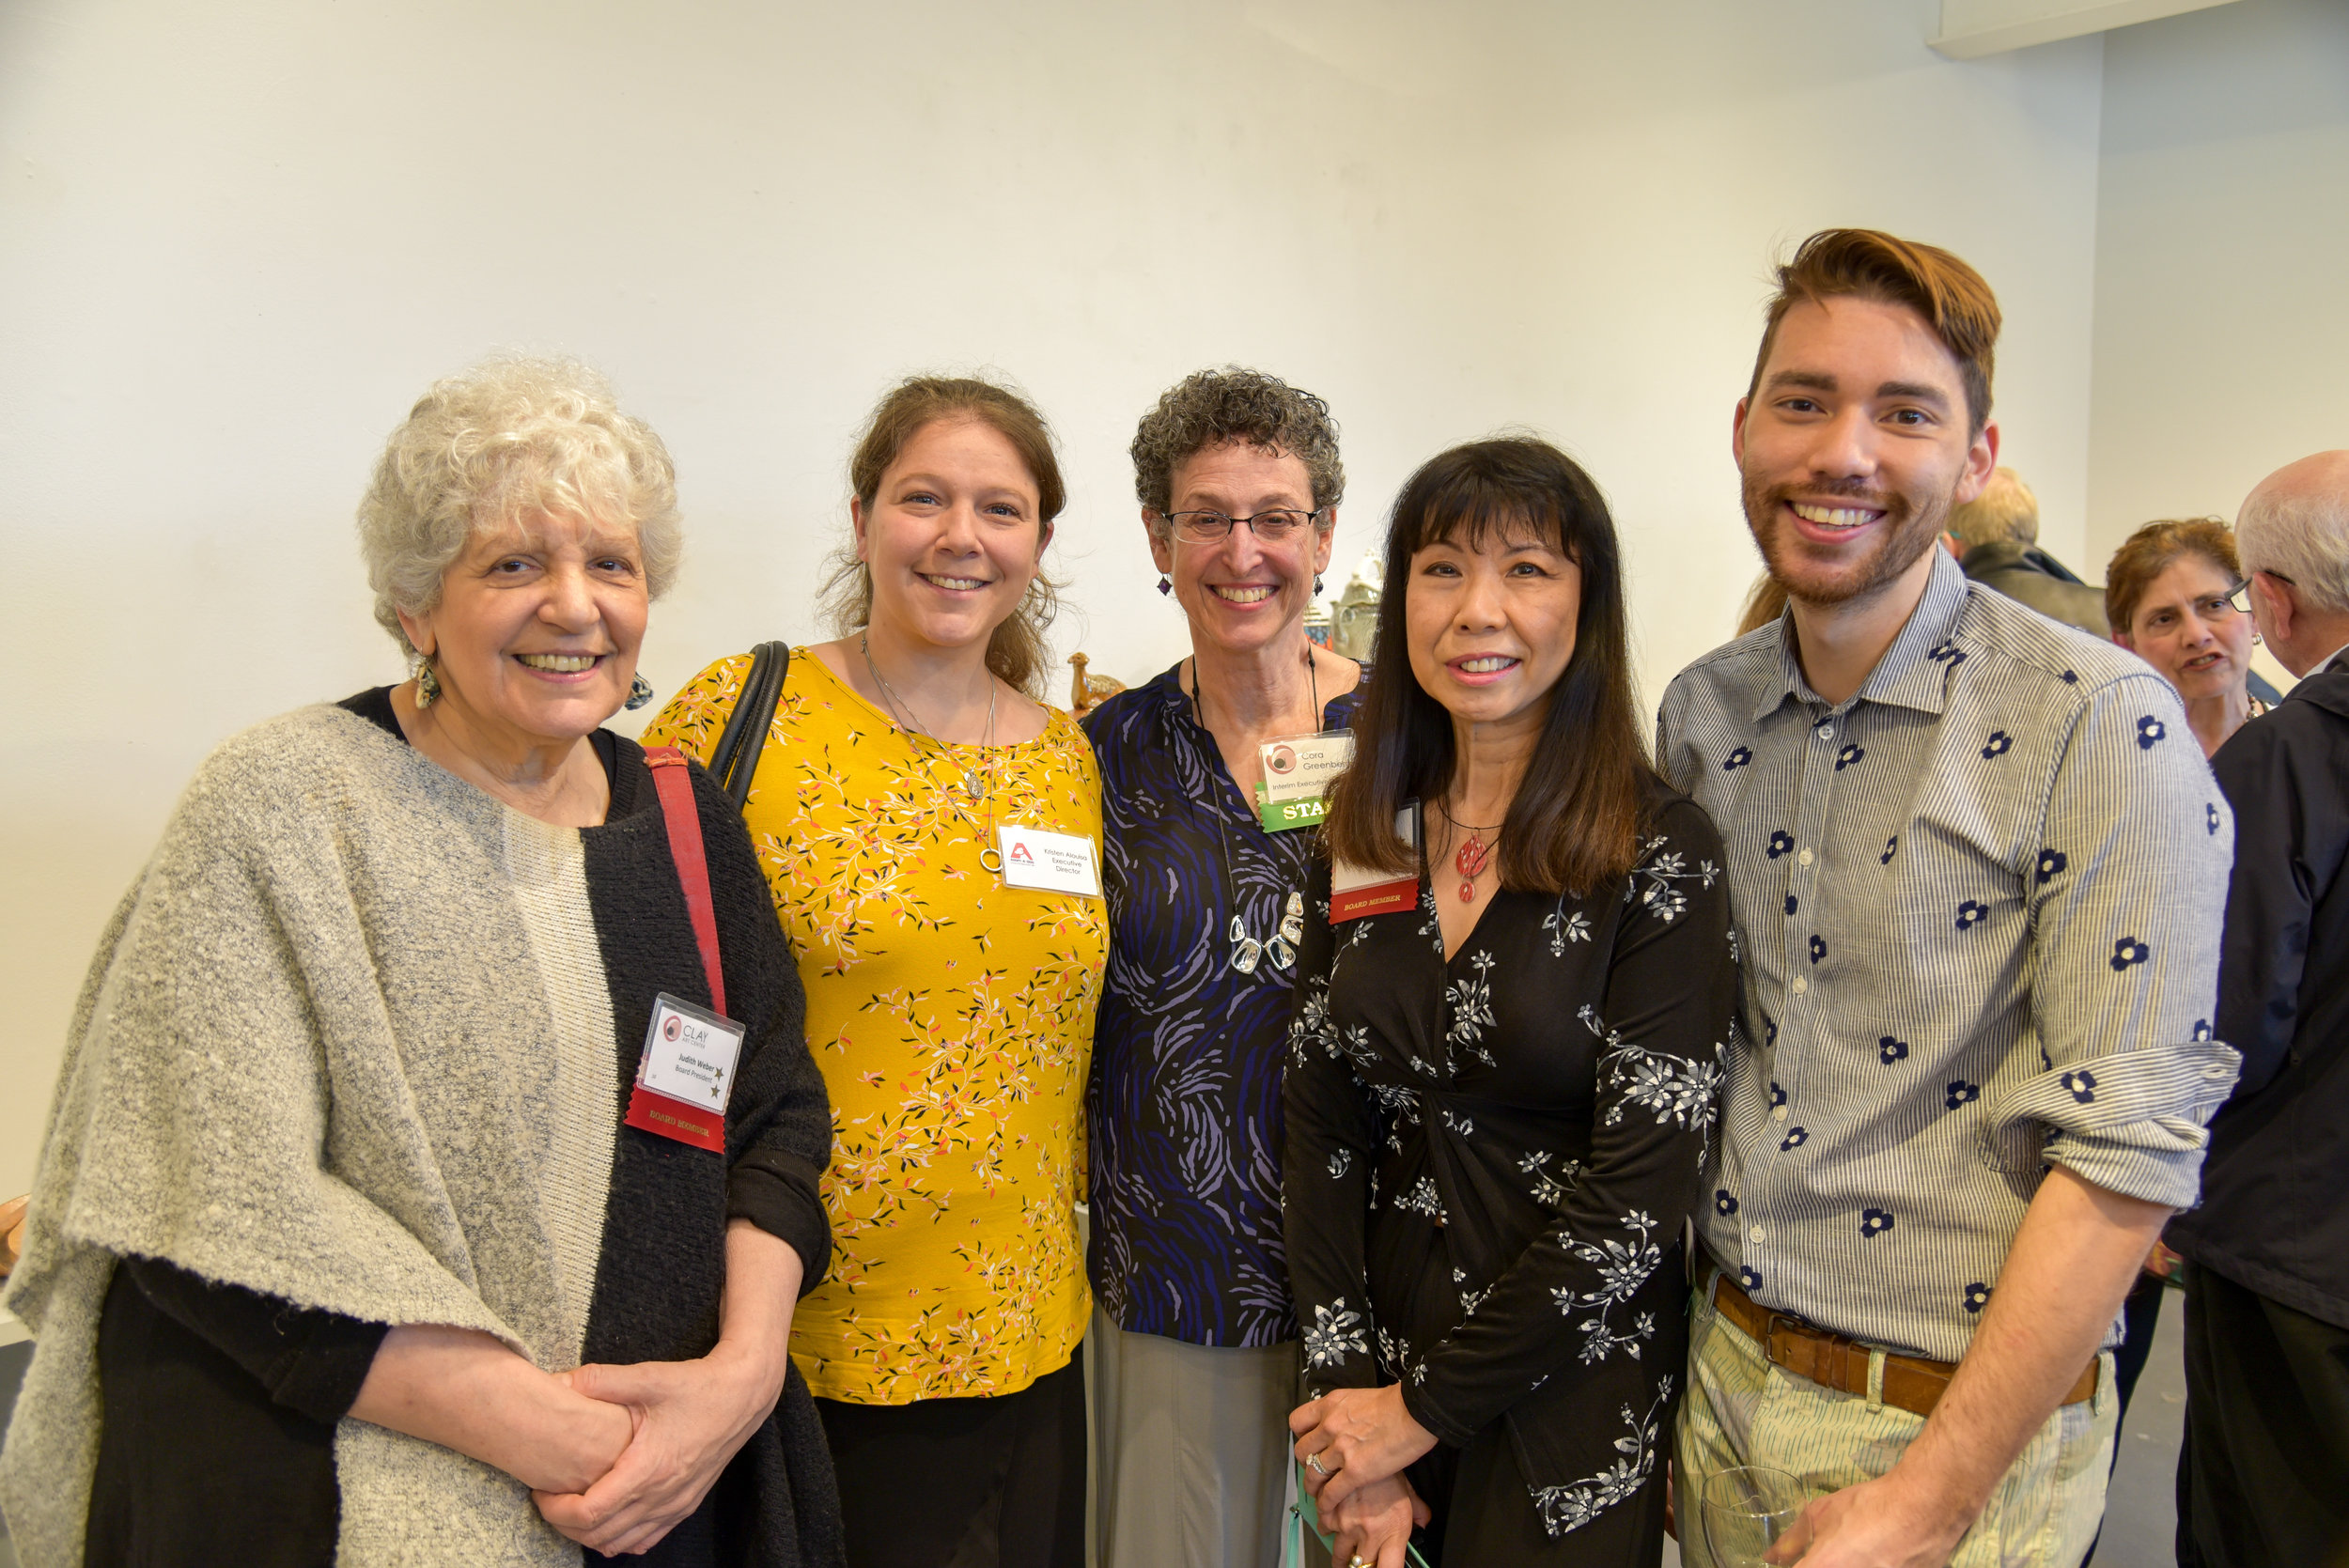 Judith Weber, CAC Board President, Kristen Alouisa, Adopt-a- Dog Executive Director, Cora Greenberg, Sally Ng, CAC Board Member, Adam Chau, Exhibitions Manager